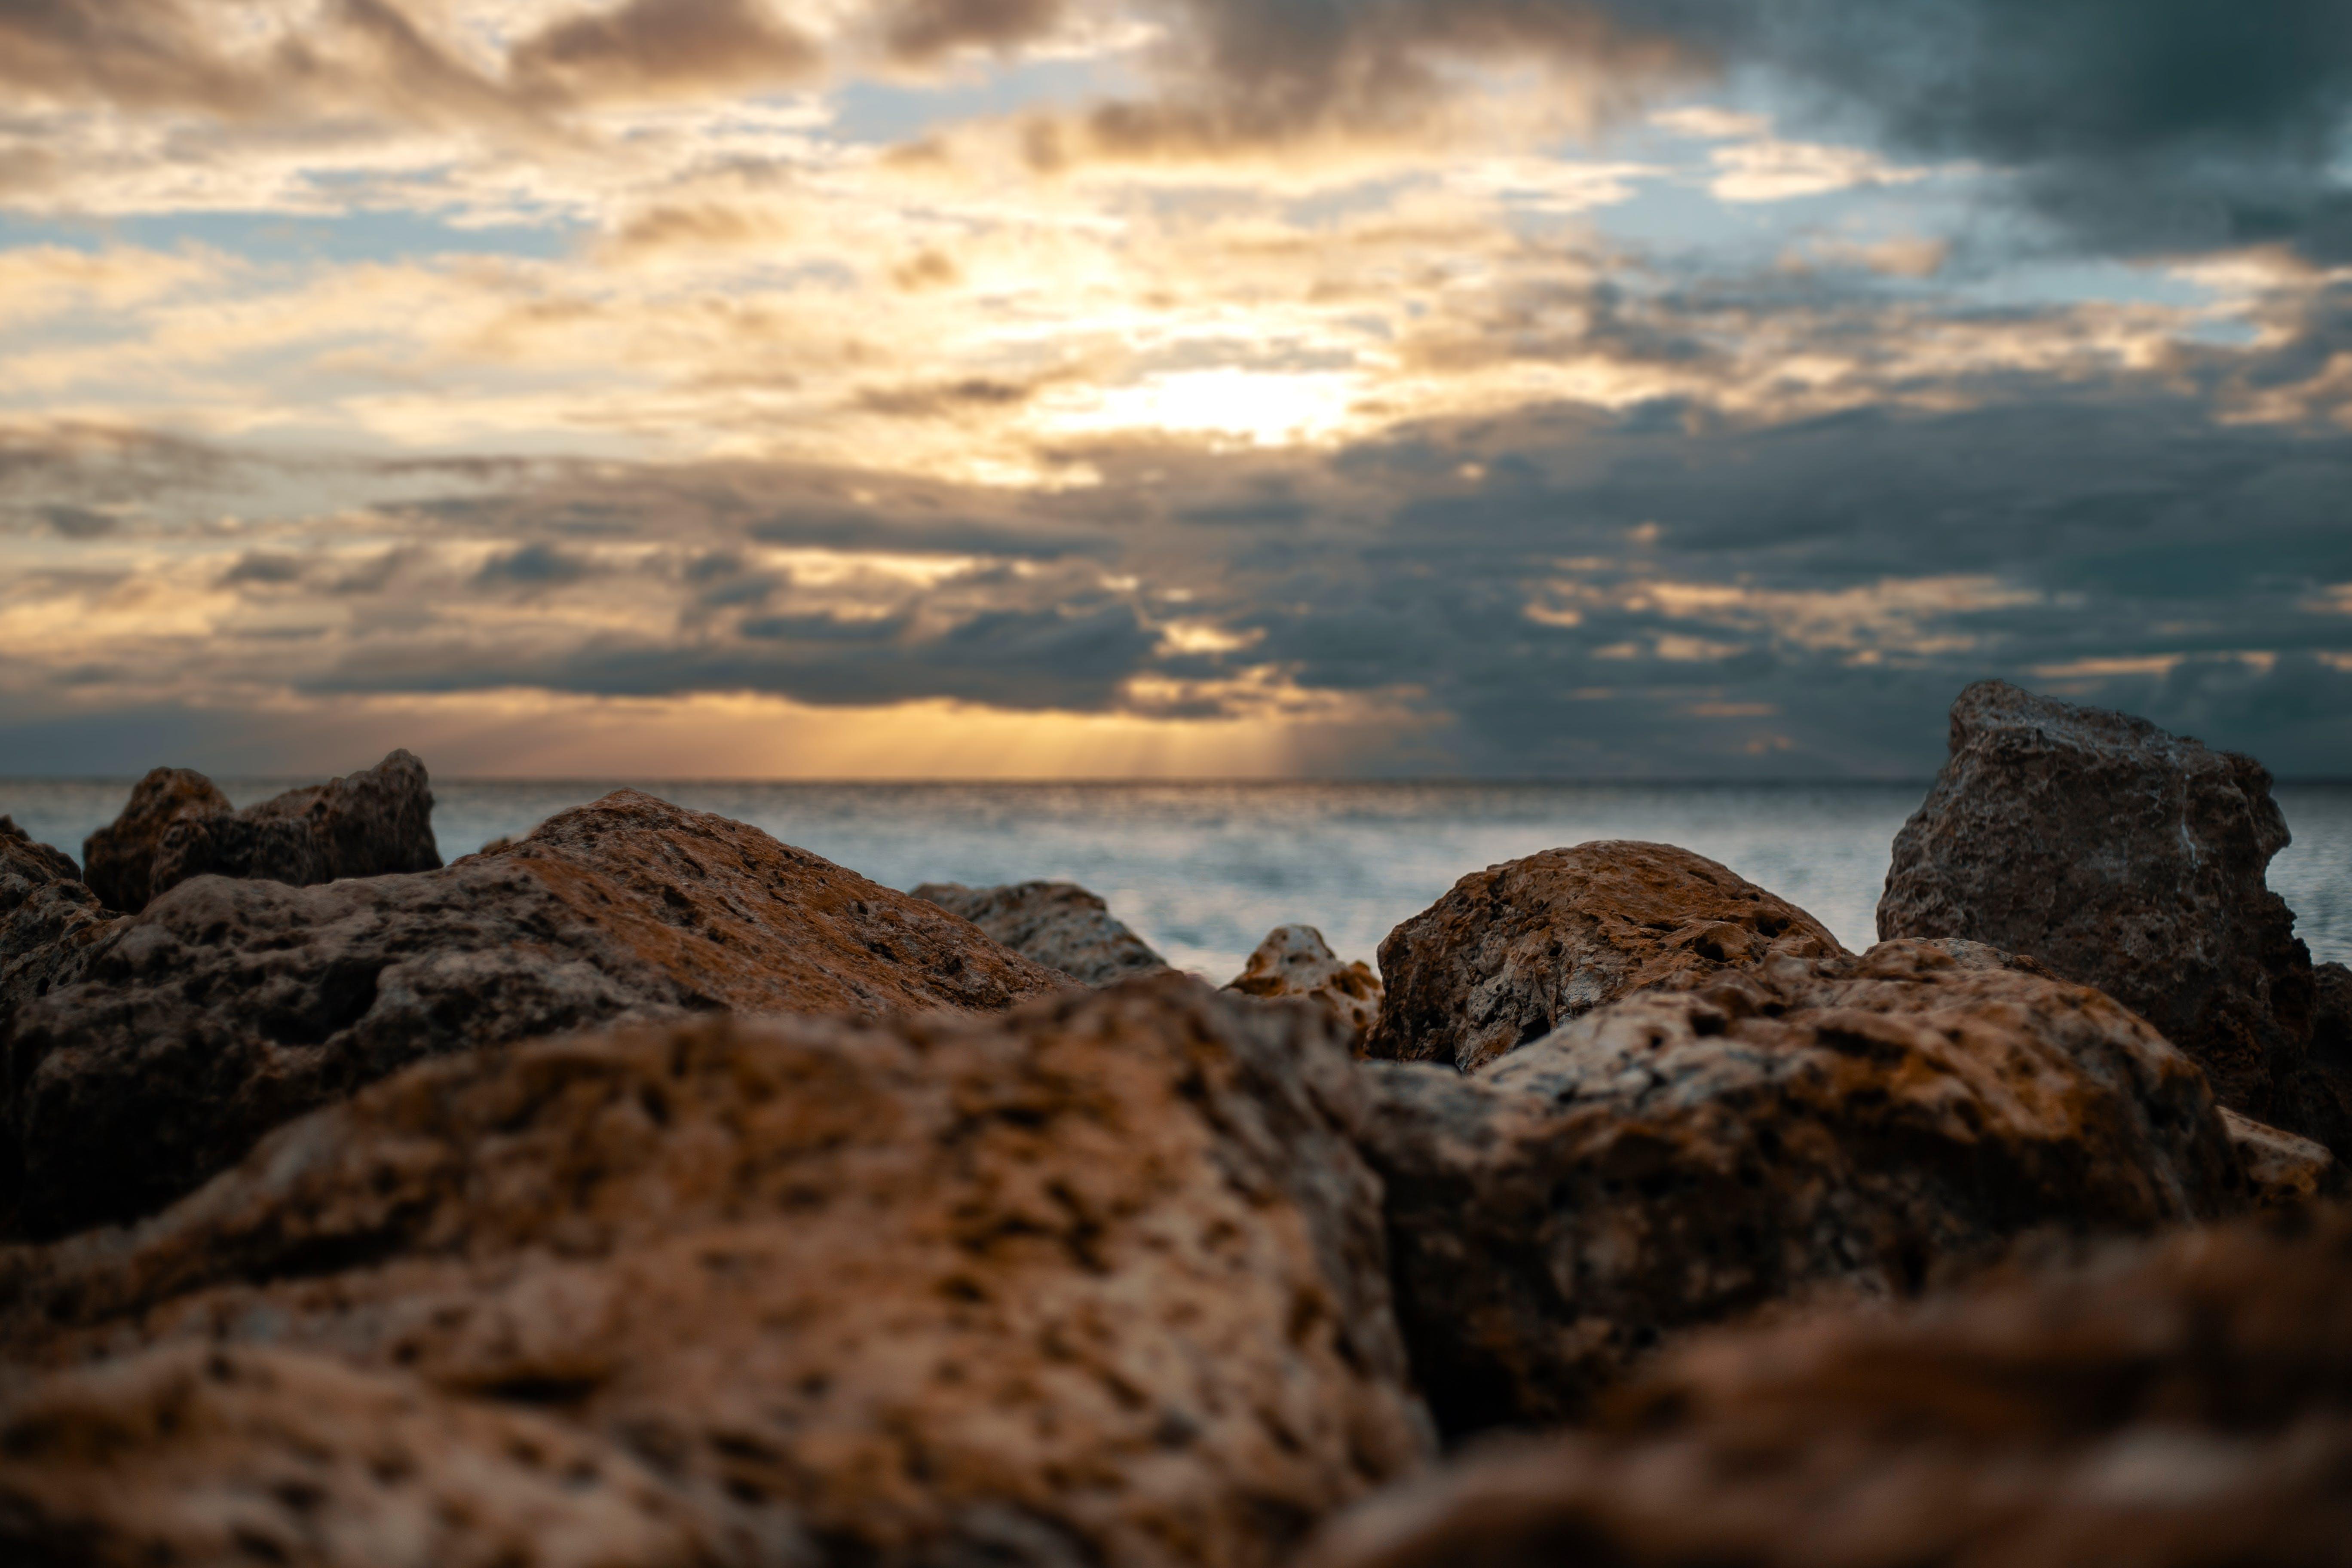 Brown Rocks Overlooking Body of Water